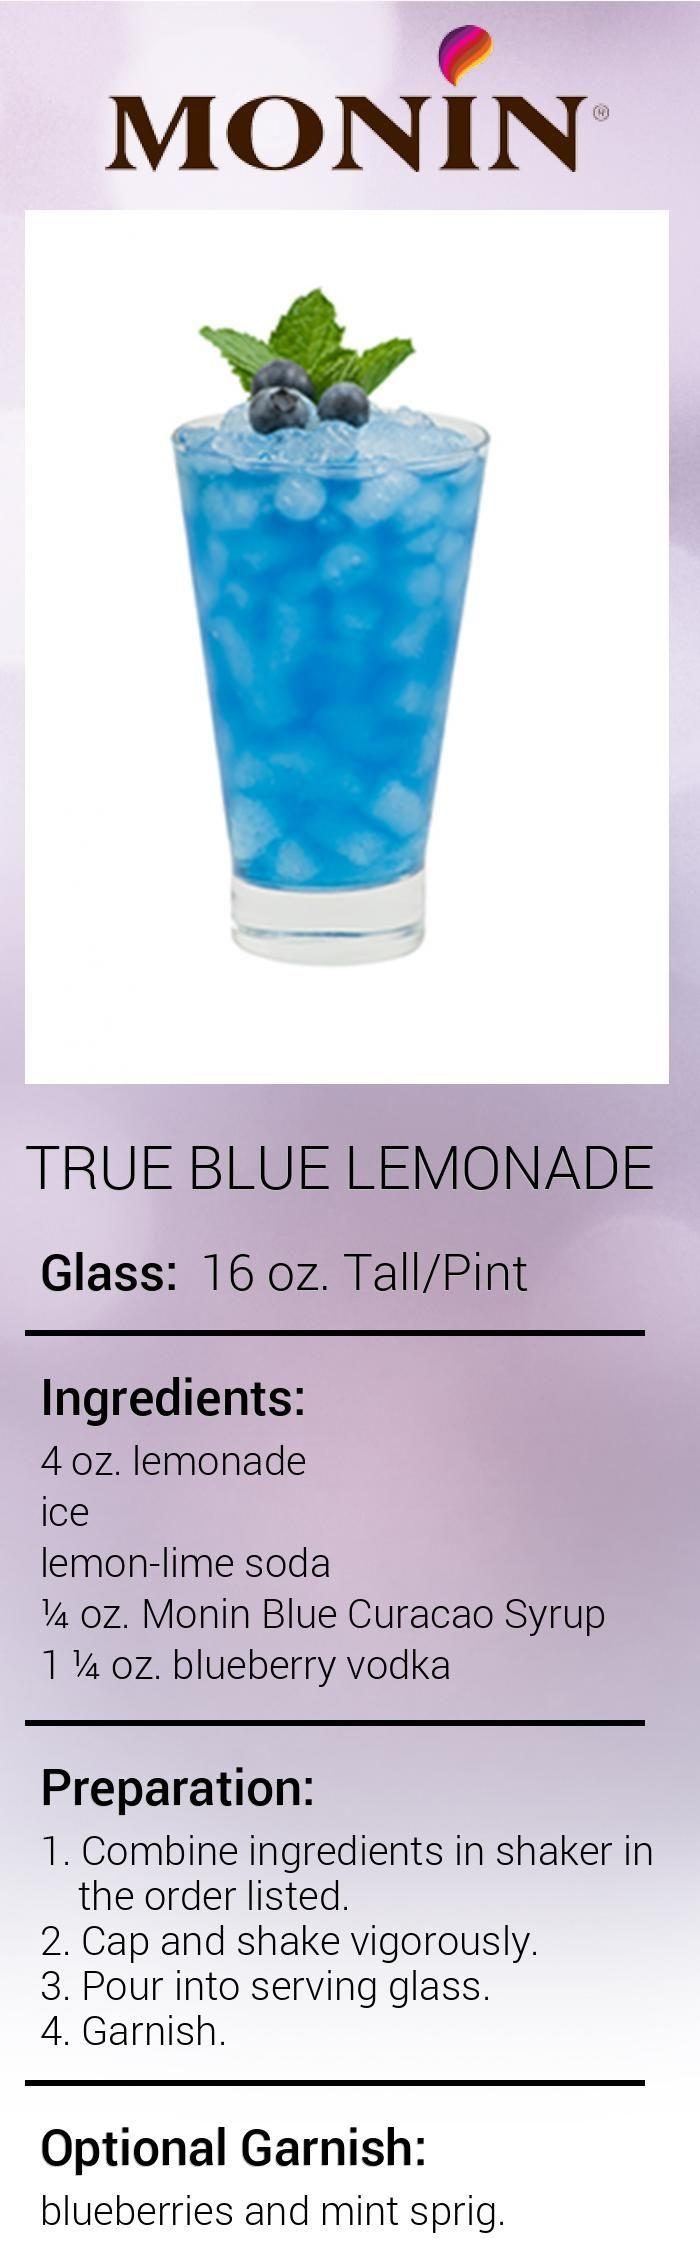 True Blue Lemonade